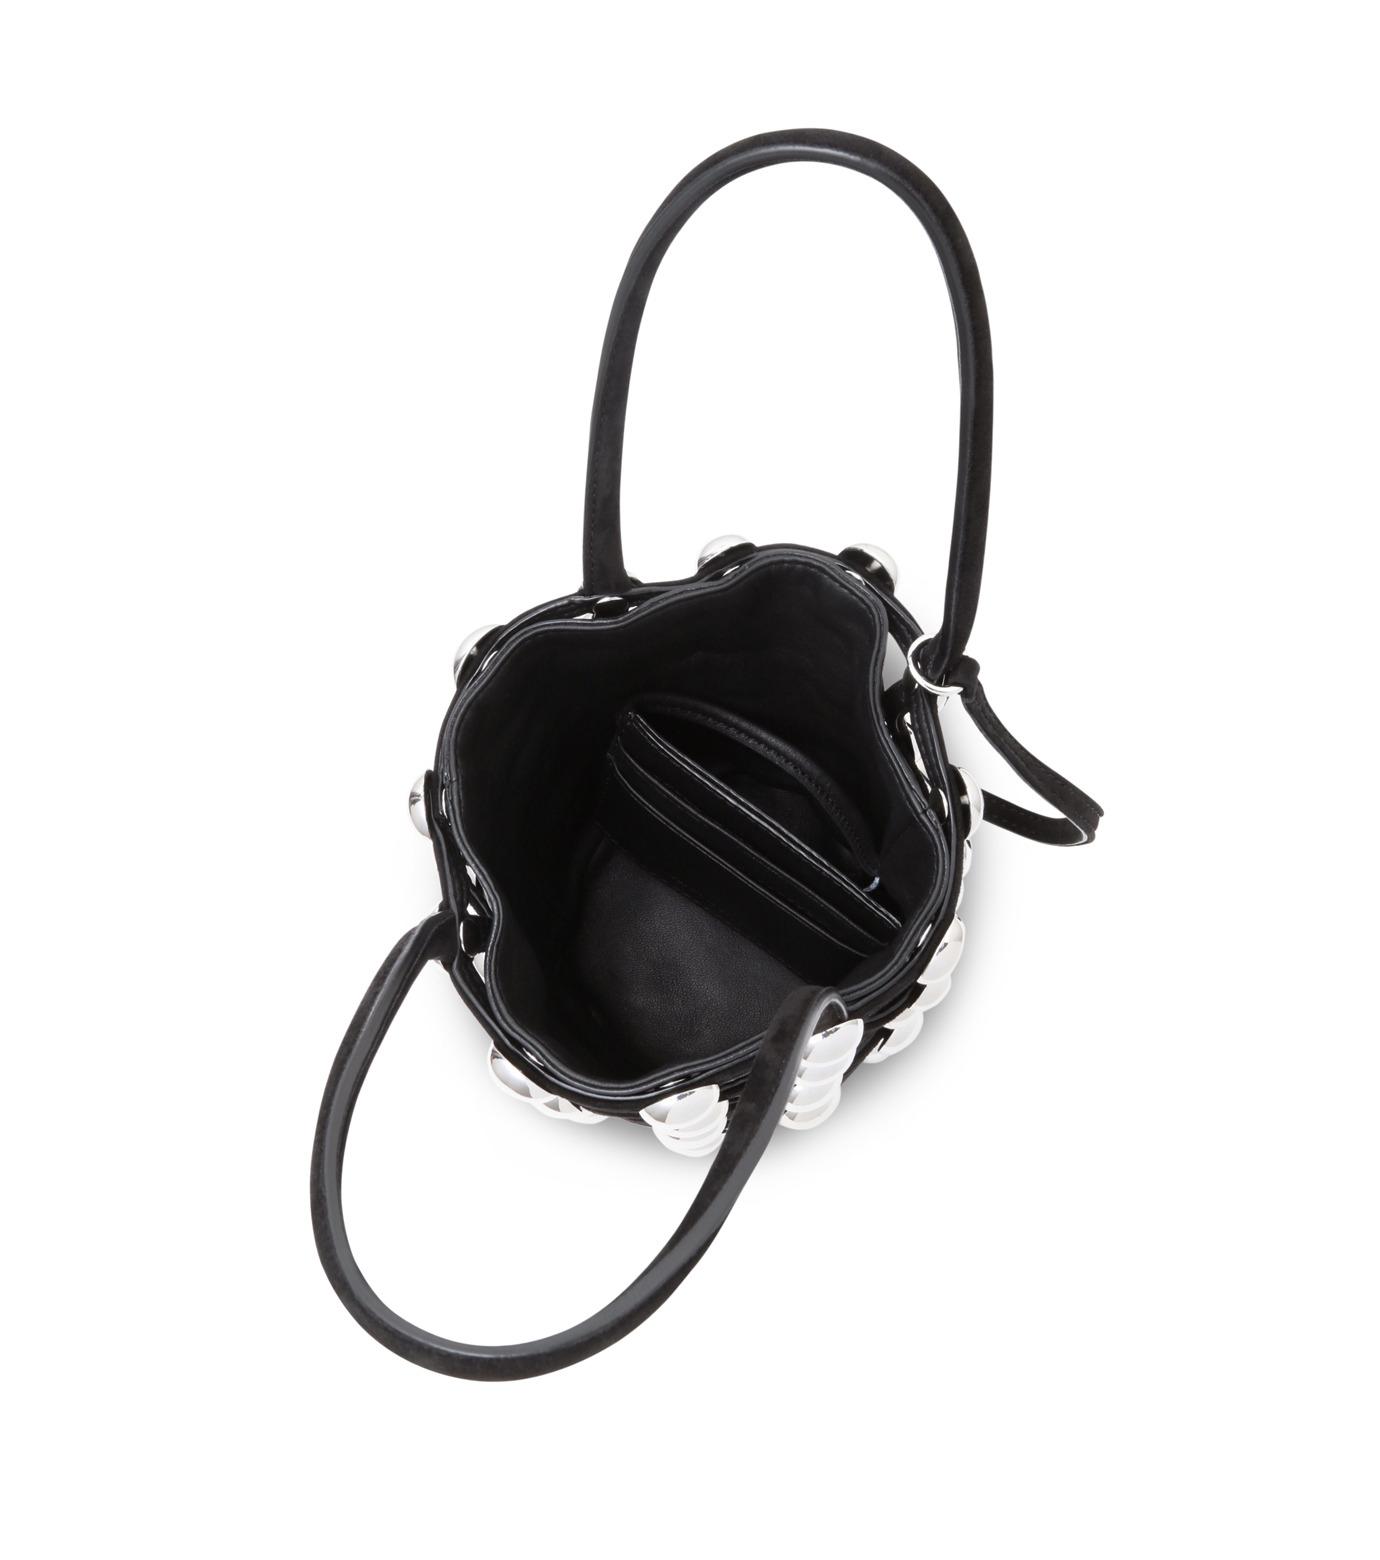 Alexander Wang(アレキサンダーワン)のRoxi Mini Bucket w/Studs-BLACK(ハンドバッグ/hand bag)-20C0038-13 拡大詳細画像4